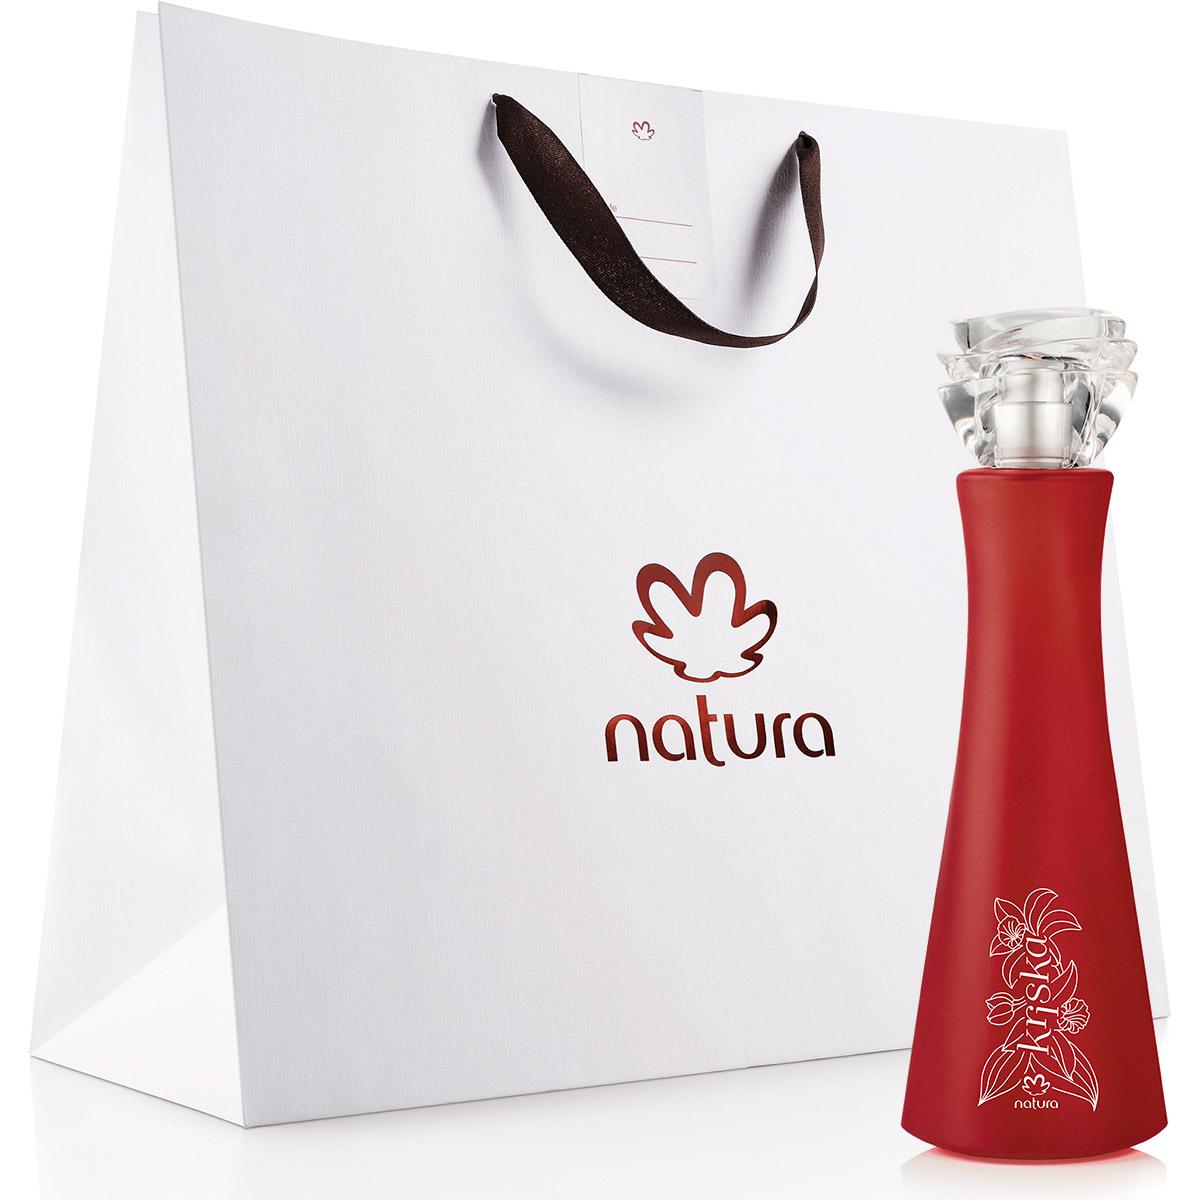 Presente Natura Colônia Kriska Feminino - 80412